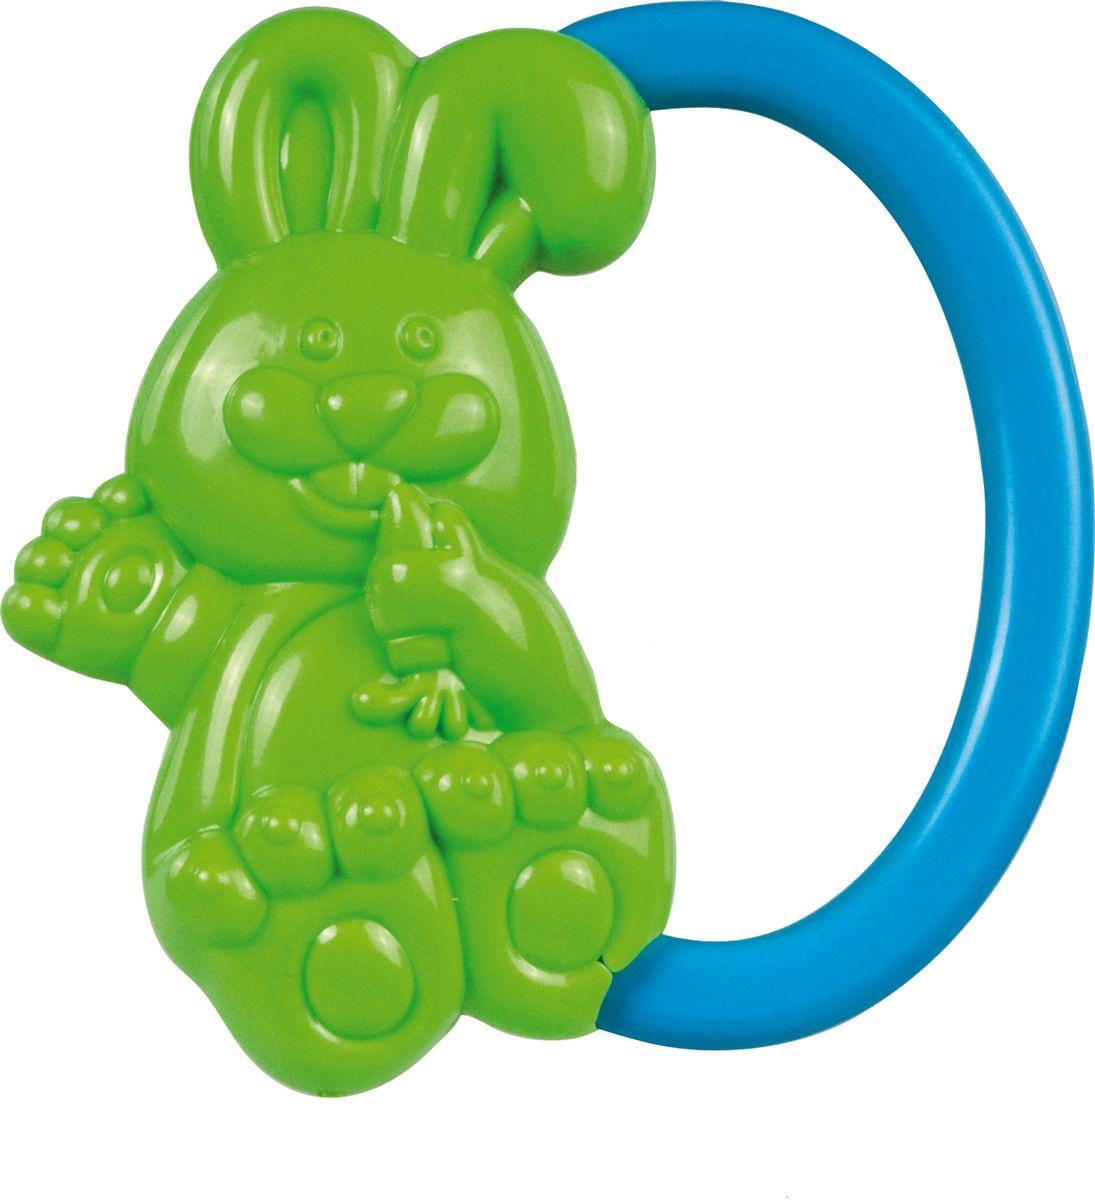 Canpol Babies Погремушка Кролик цвет зеленый canpol babies погремушка улитка 0 canpol babies зеленый